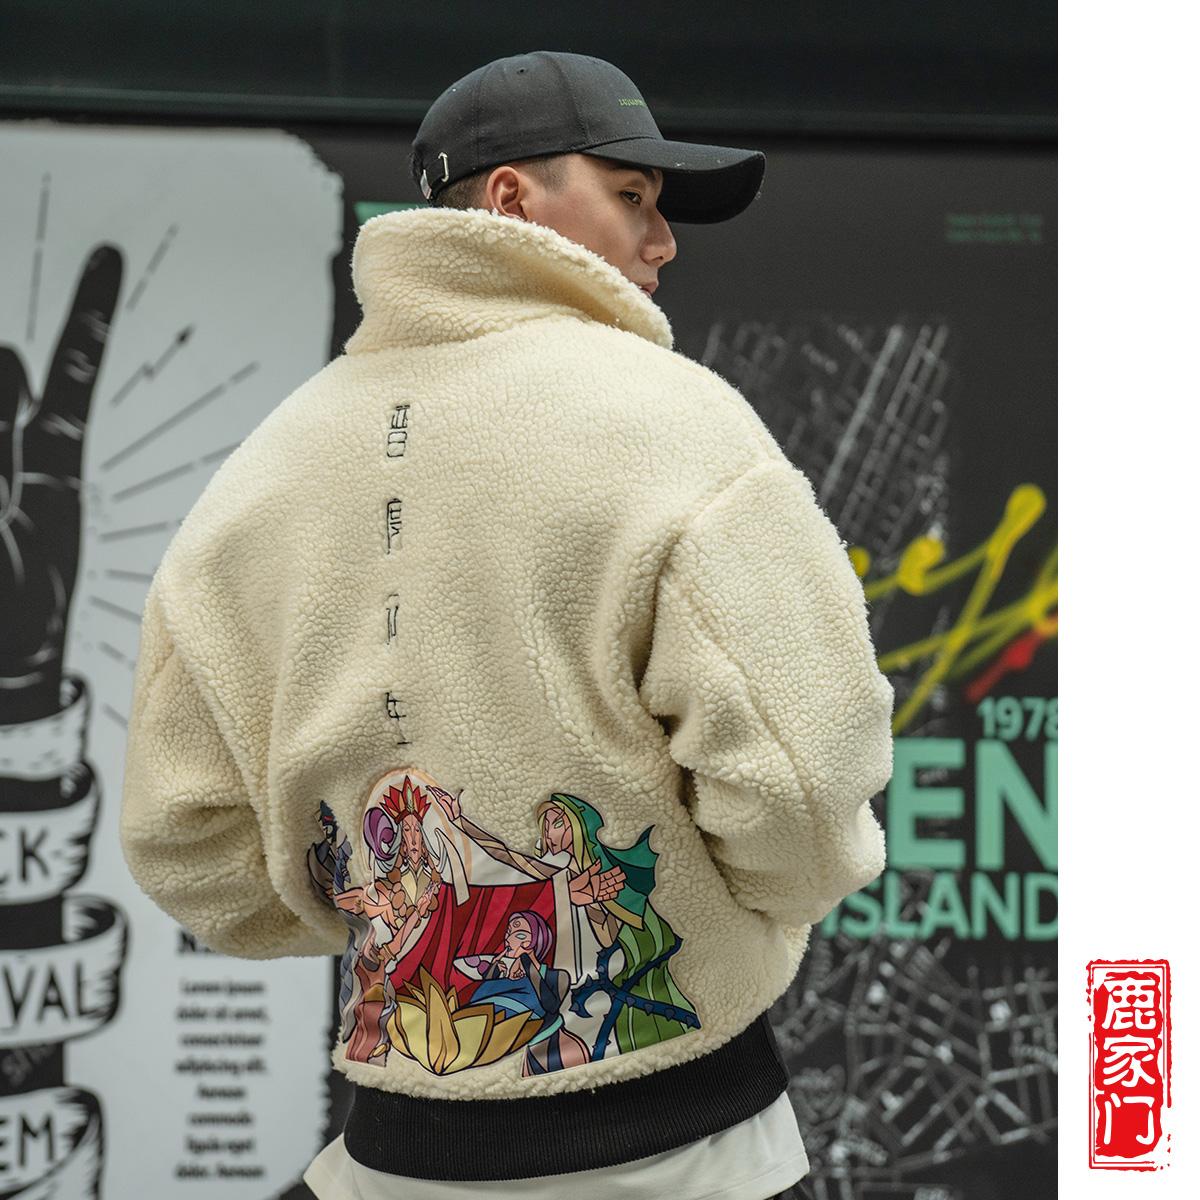 BD鹿家门秋季新款刺绣羊羔绒男装潮流外套加厚正反两穿夹克上衣男